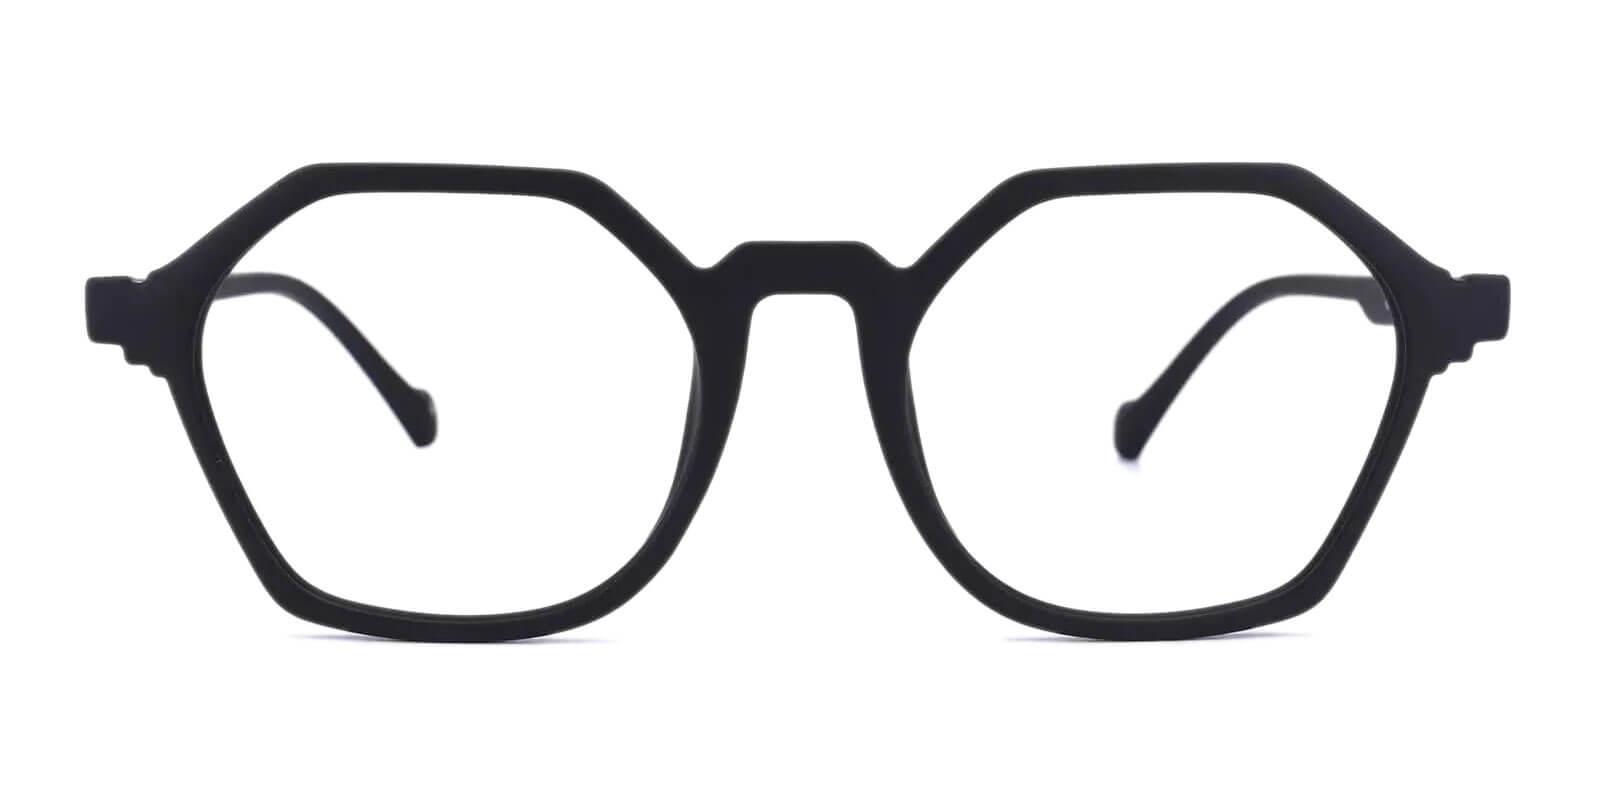 Sofia Black TR Eyeglasses , UniversalBridgeFit Frames from ABBE Glasses